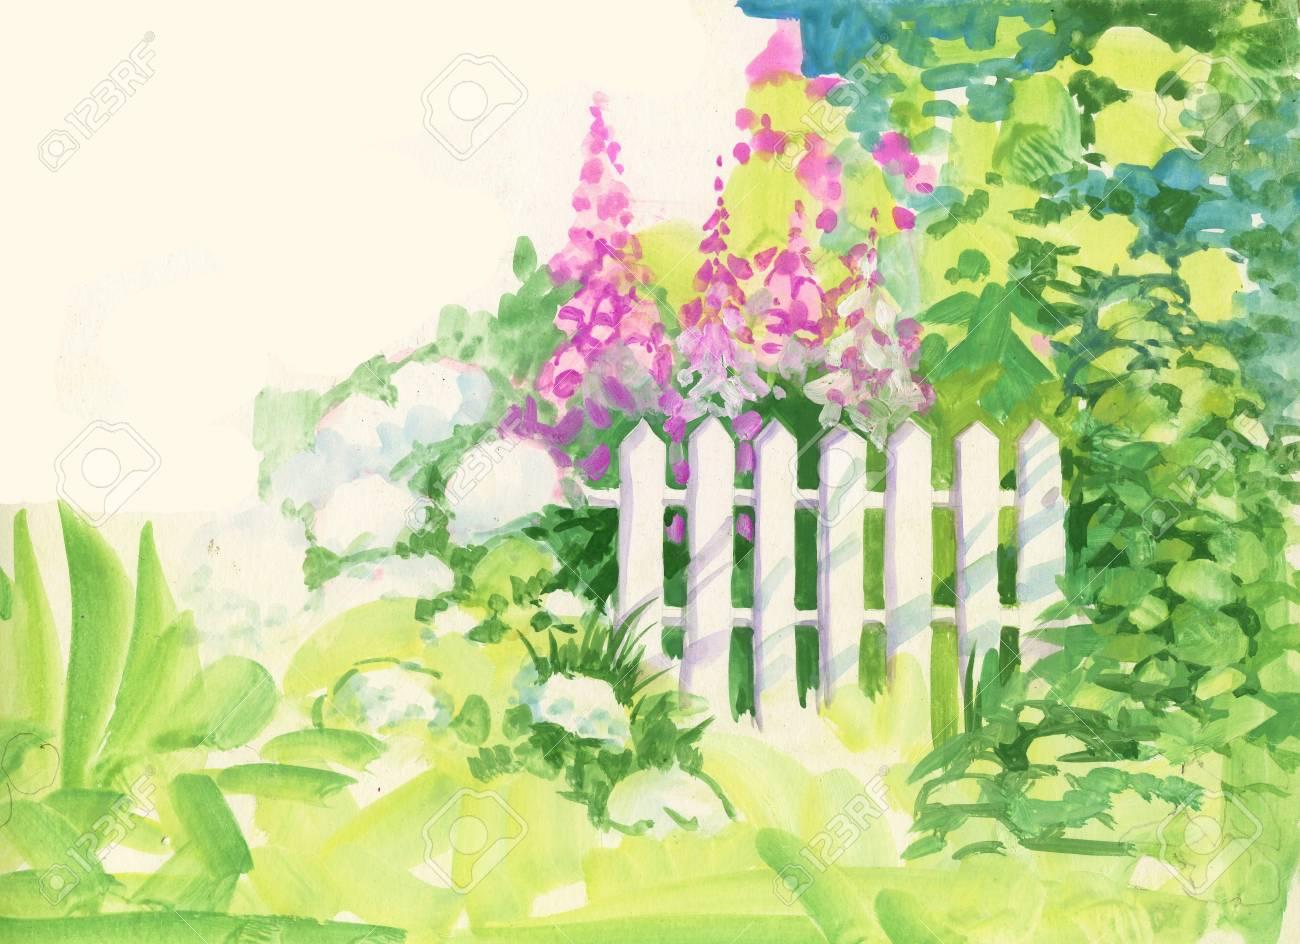 Watercolor Rural wooden fence in the garden - 38168263